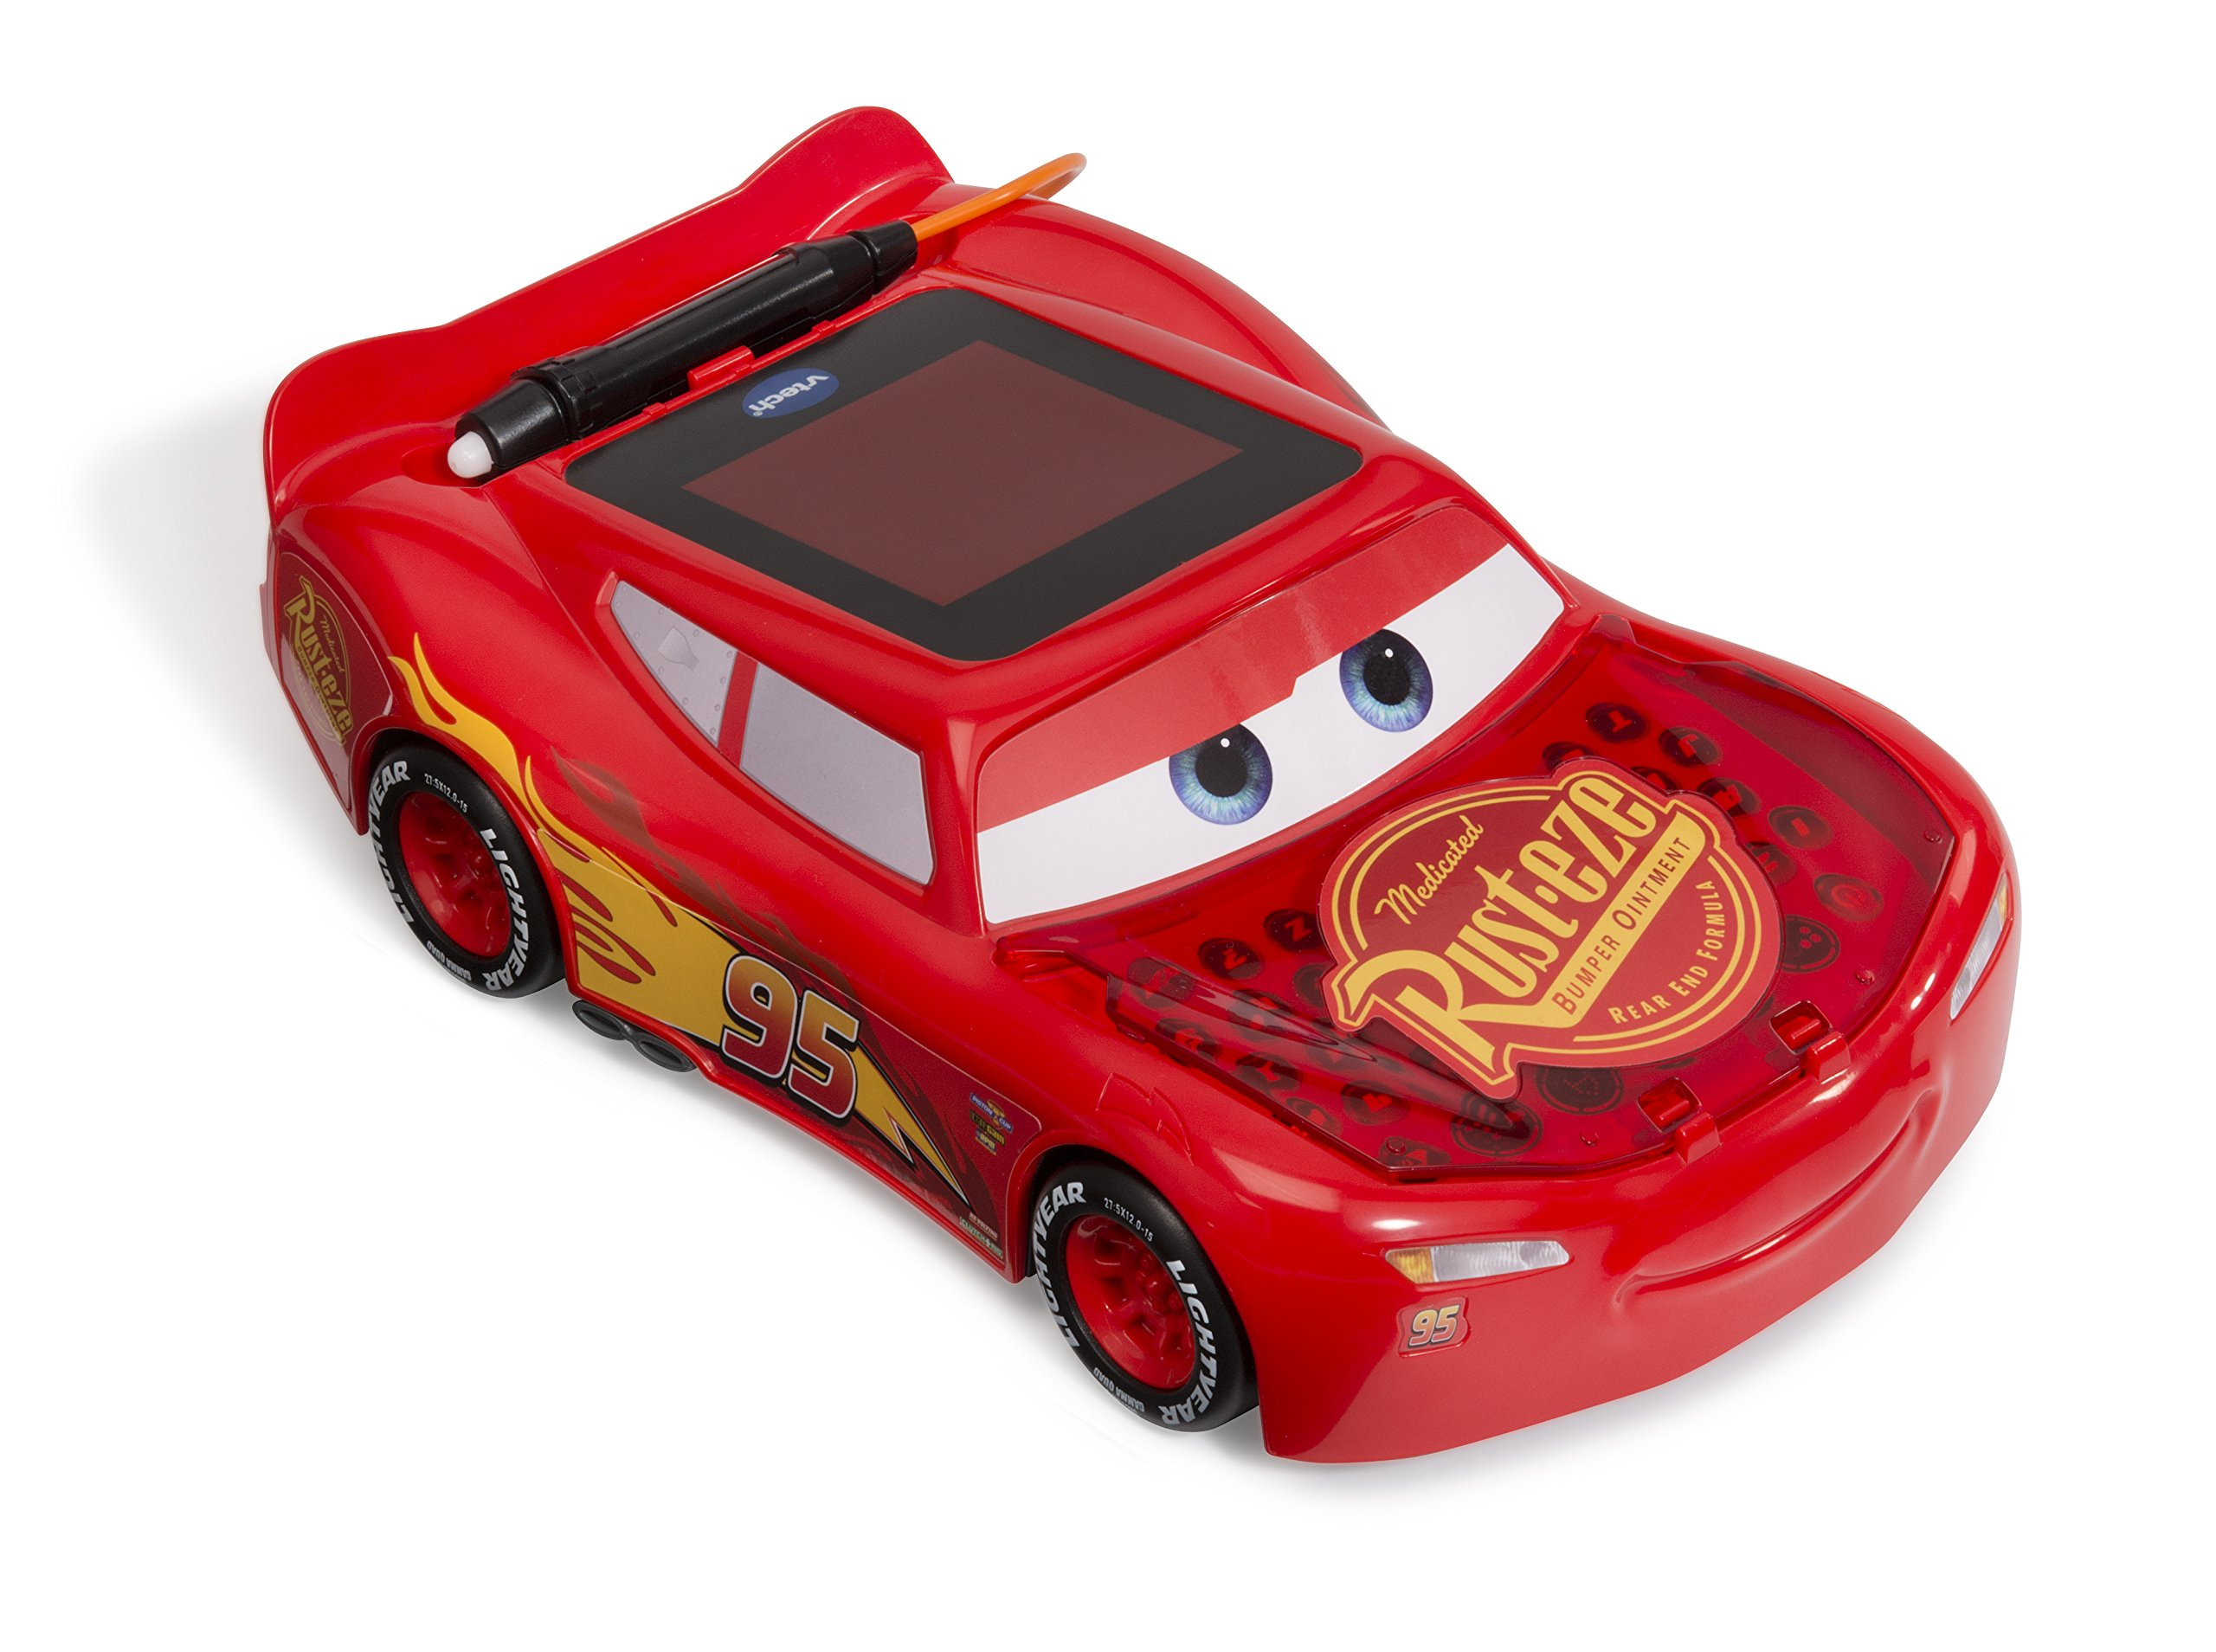 VTech Cars Race & Trace Lightning McQueen by VTech